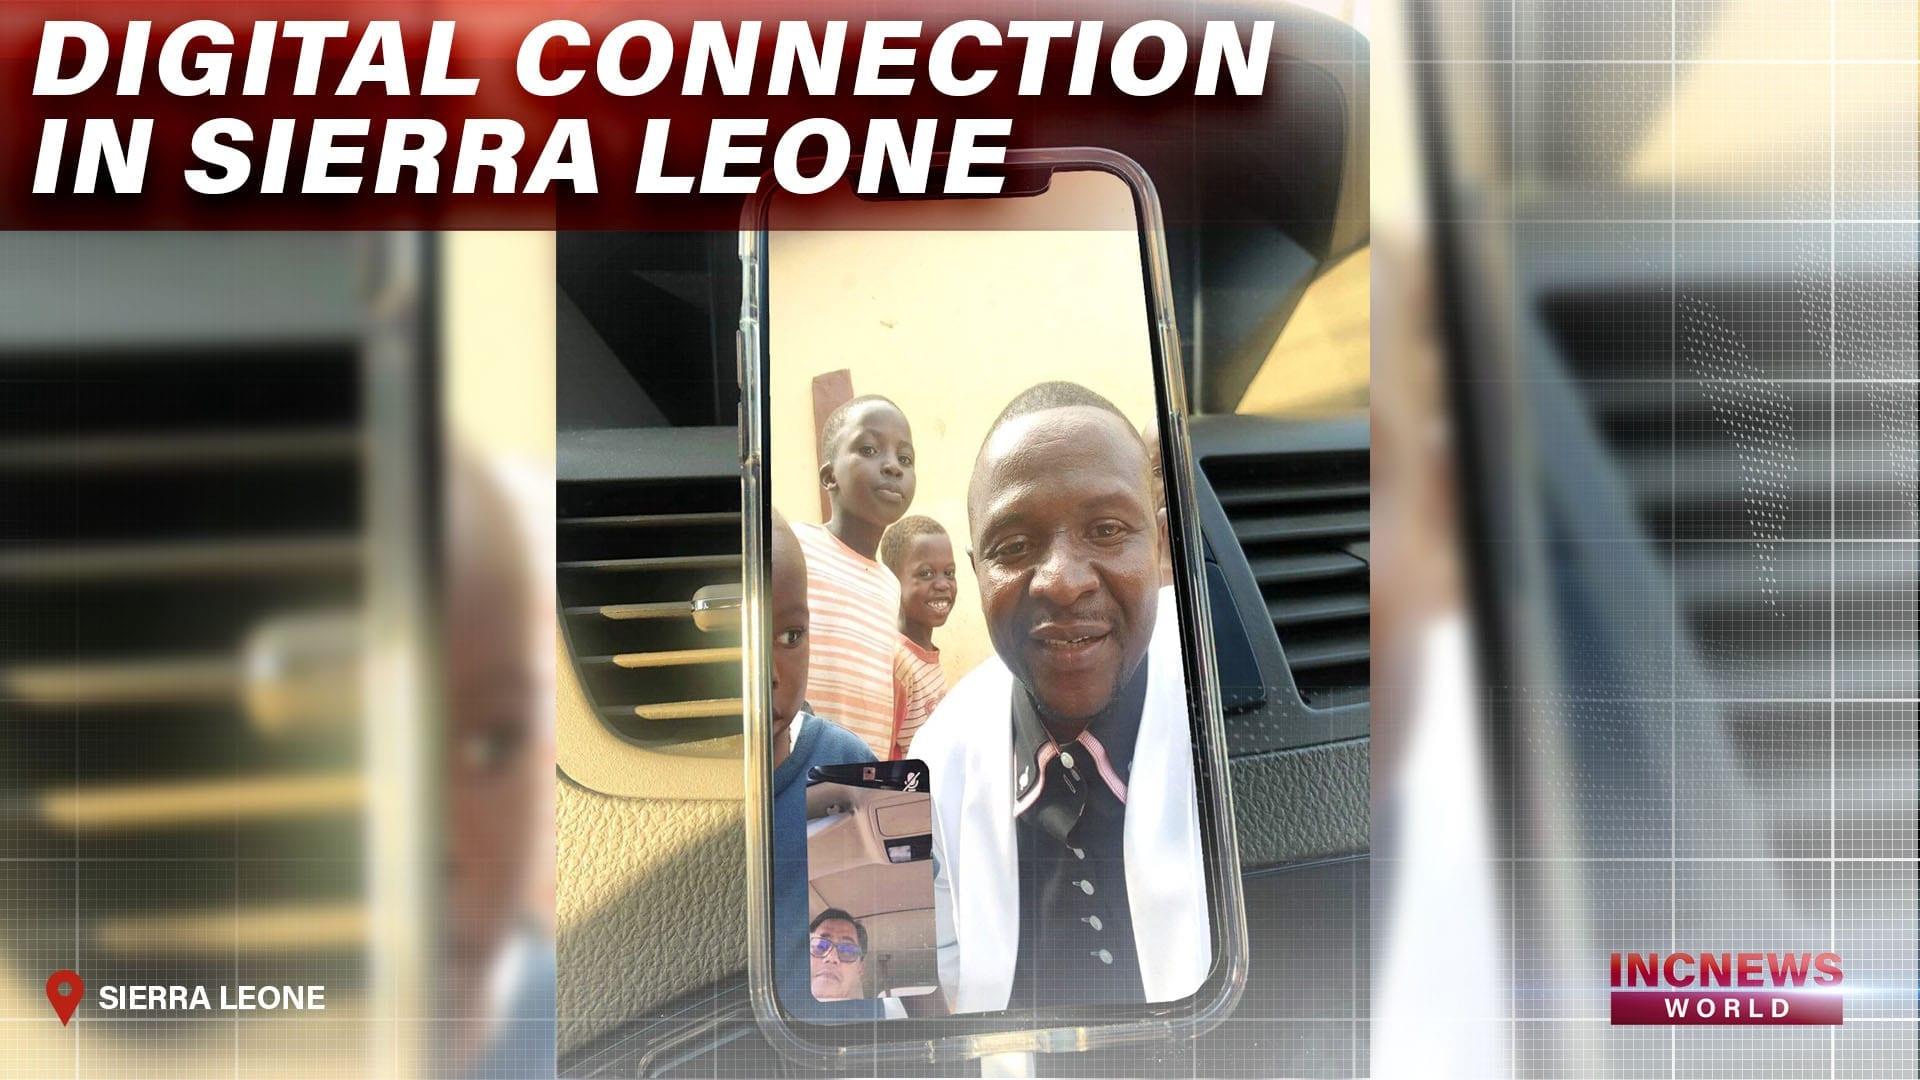 Digital Connection in Sierra Leone